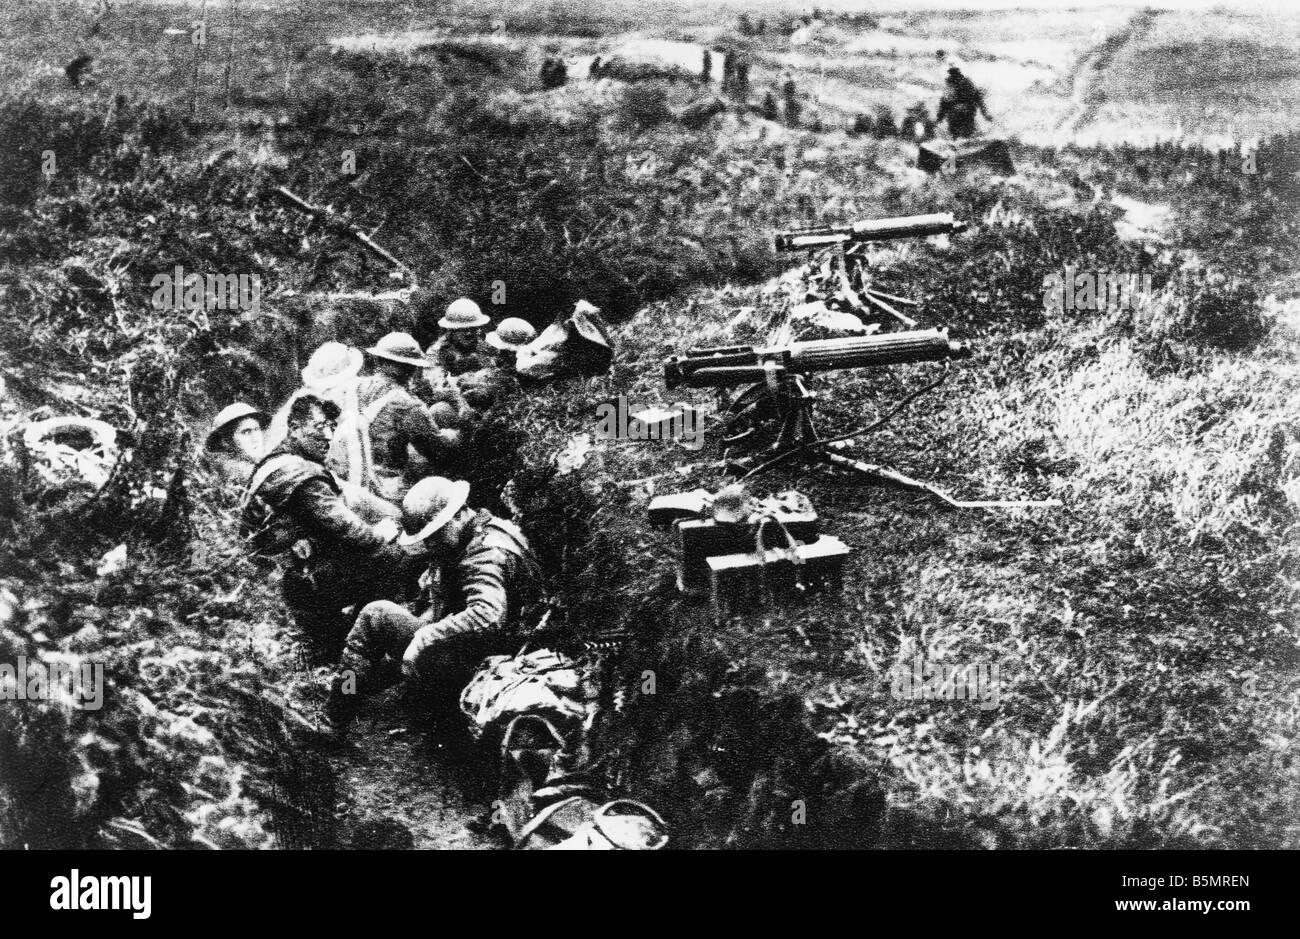 9 1917 11 20 A2 24 E Battle of Cambrai 1917 Eng Machineguns WWI 1914 18 France Battle of Cambrai 20 29 11 1917 British - Stock Image